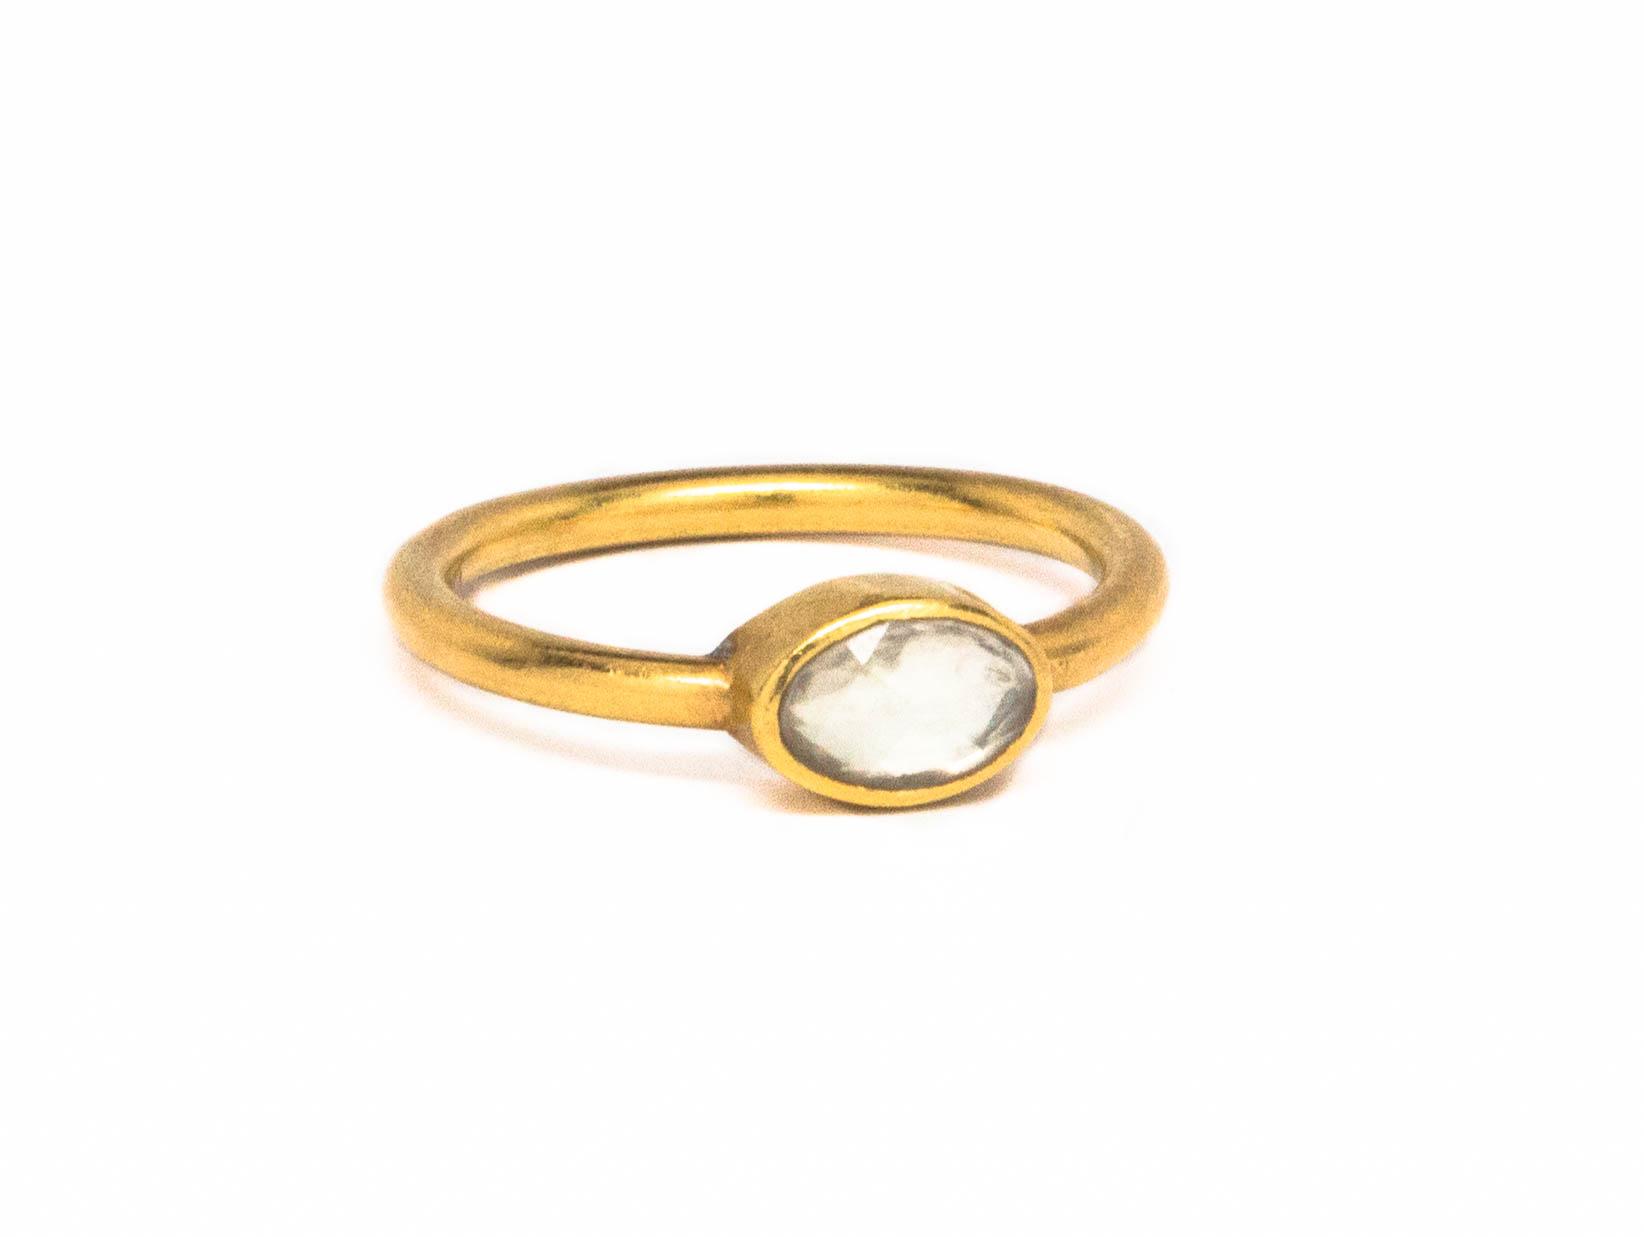 dec19 jewelry2-171.jpg